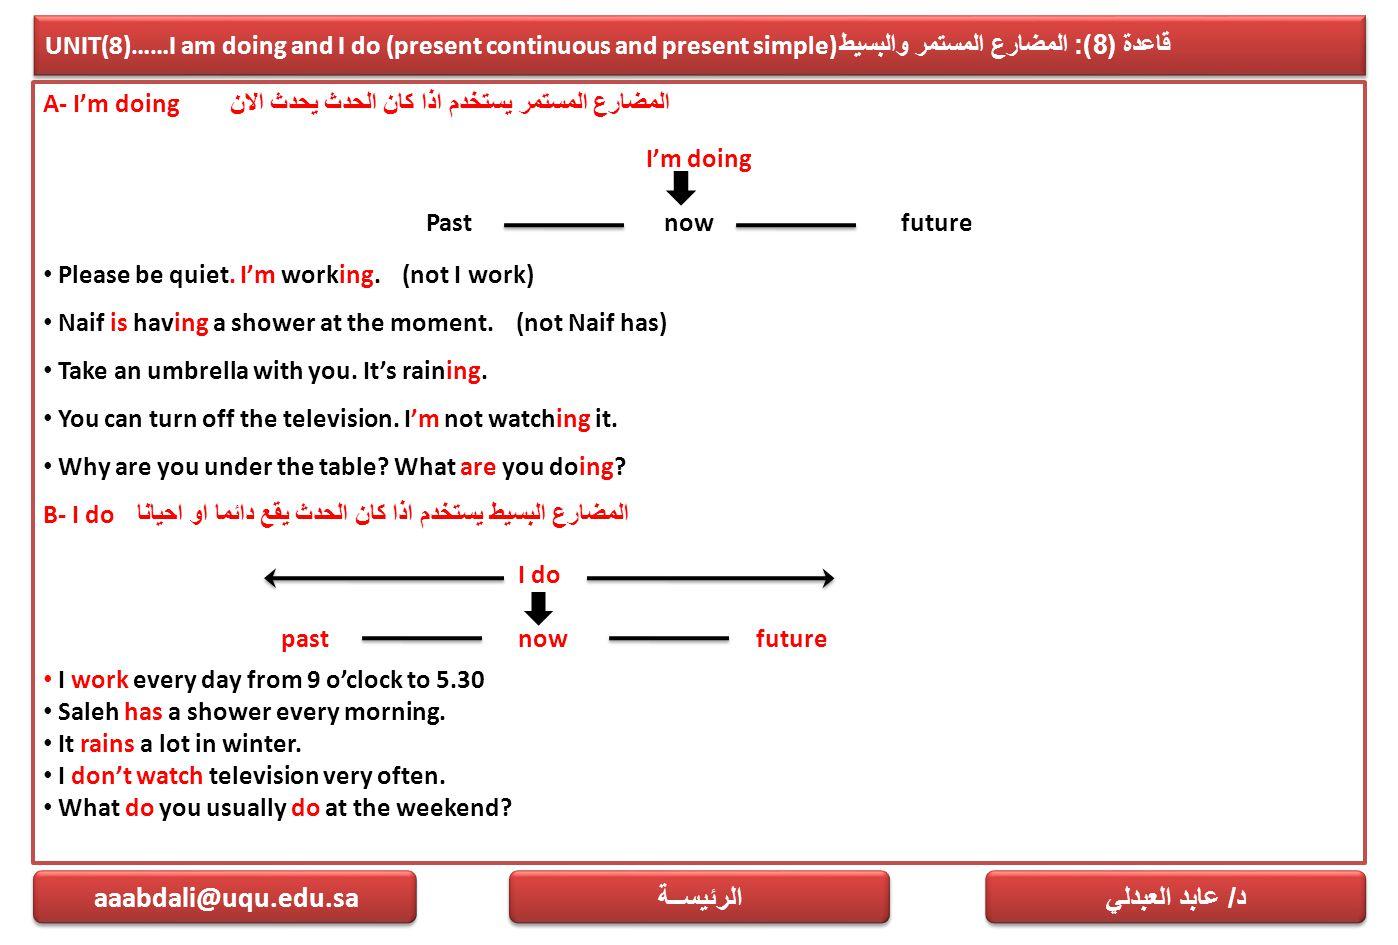 UNIT(8)……I am doing and I do (present continuous and present simple) قاعدة (8): المضارع المستمر والبسيط A- I'm doing المضارع المستمر يستخدم اذا كان ال